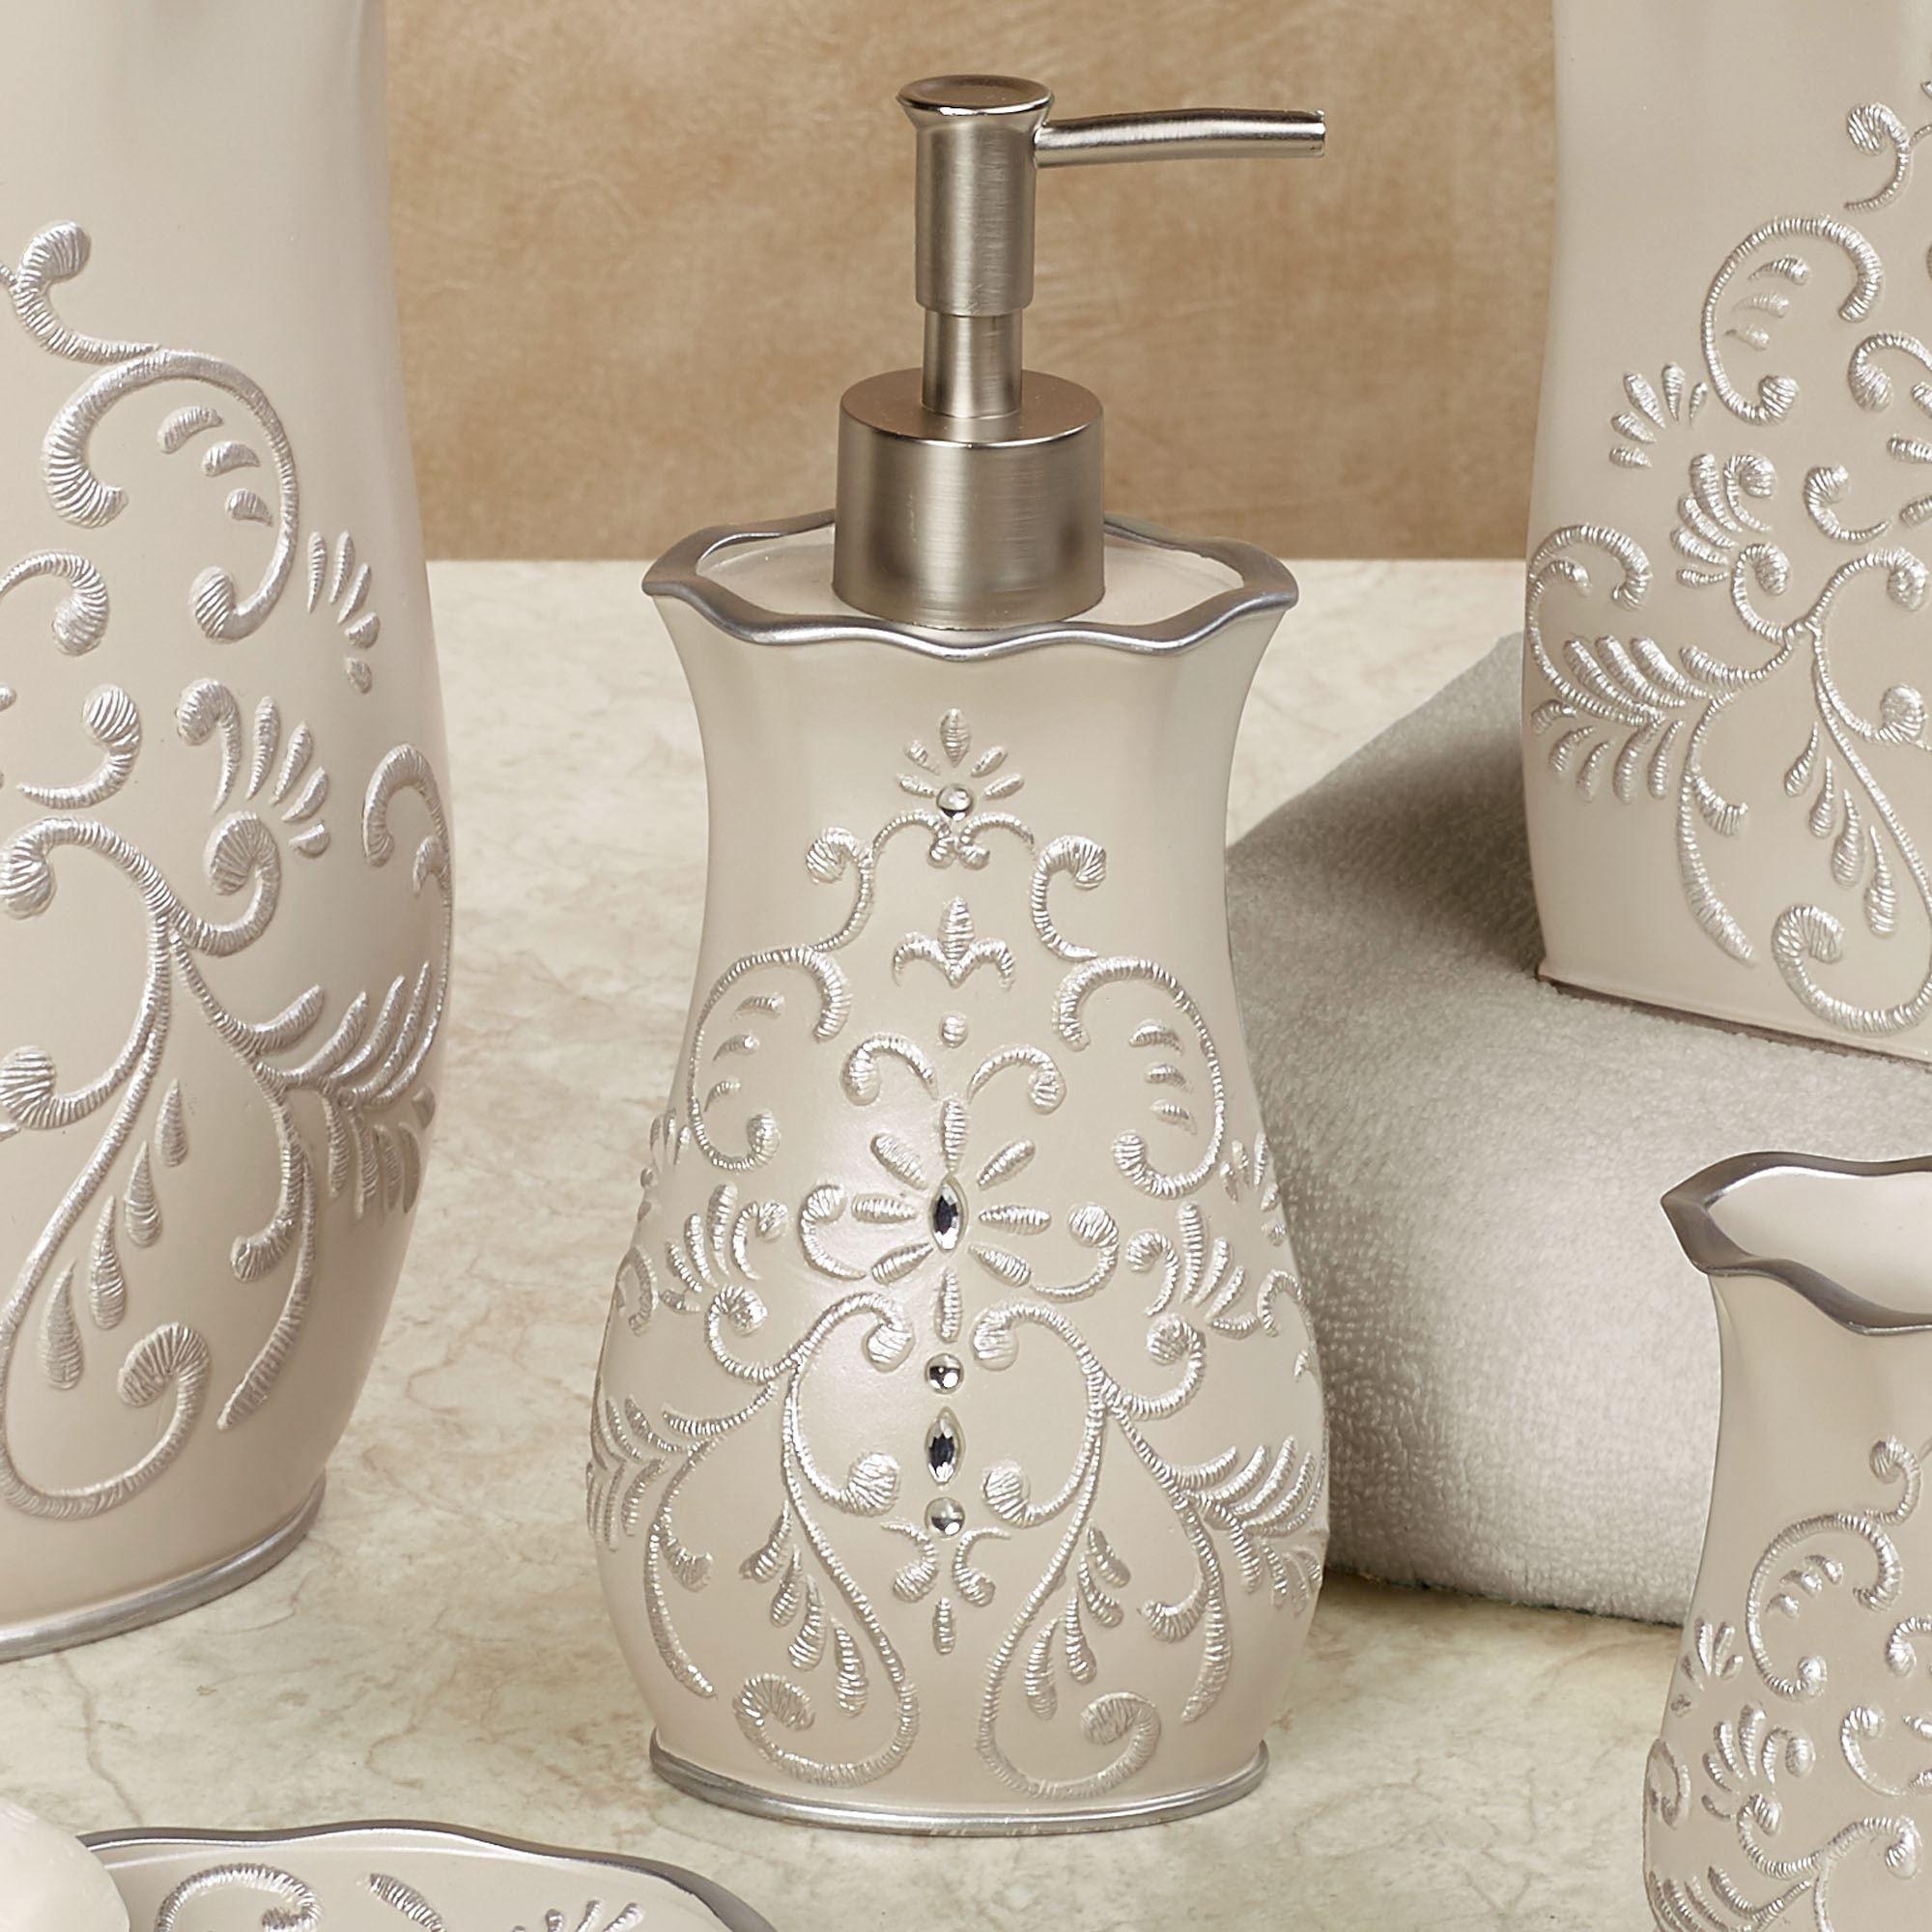 Elegant Regal Lotion Soap Dispenser Beige